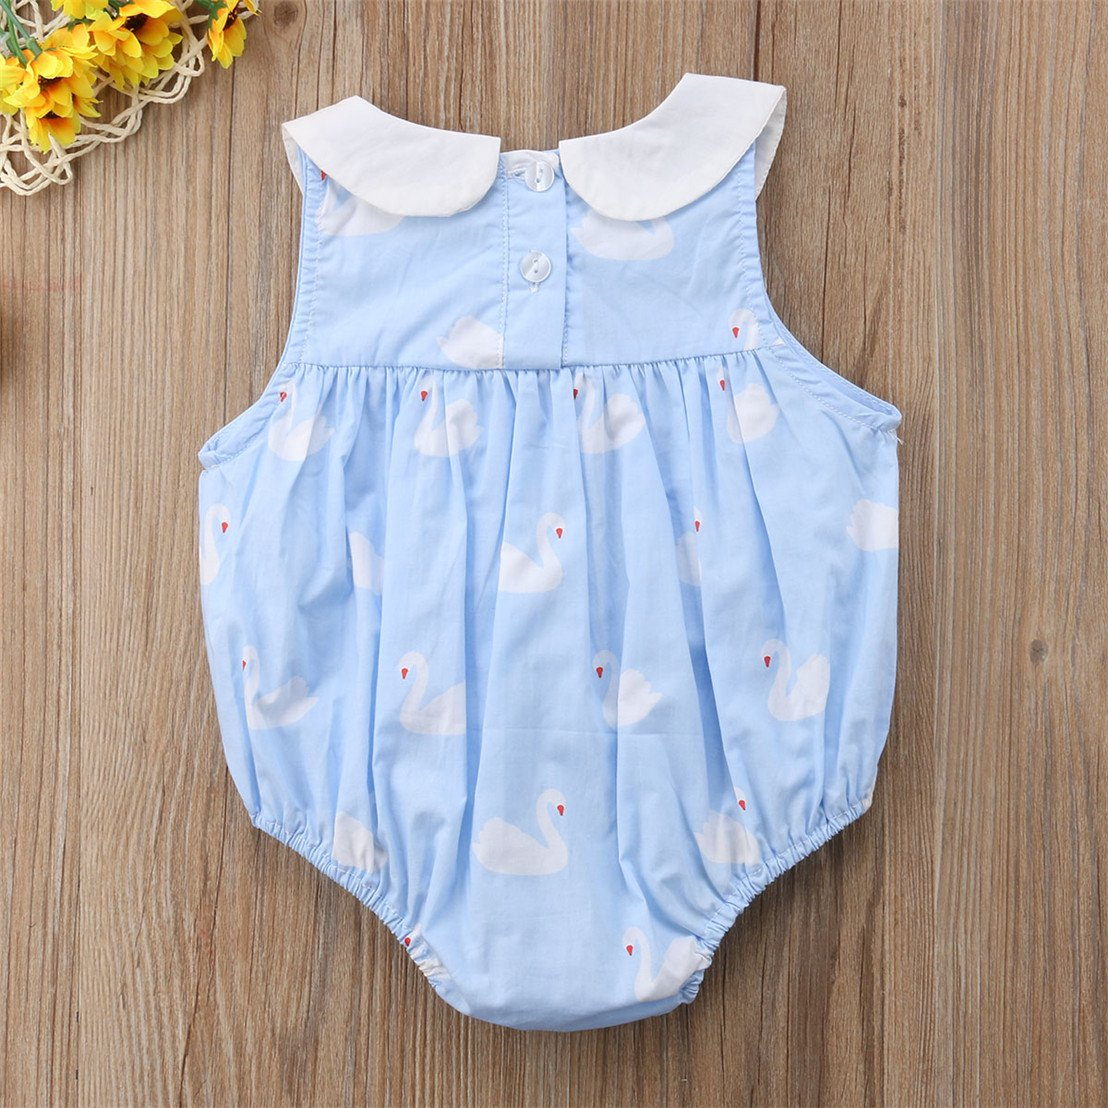 9732d5b59177 ... Girl Plaid Romper Outfit Newborn Girls  cheaper 8b7e4 fcd64 Mornbaby  Newborn Girl Clothes Baby Girl Ruffles Romper Lace Sleeveless Outfit Grey  Bodysuit ...